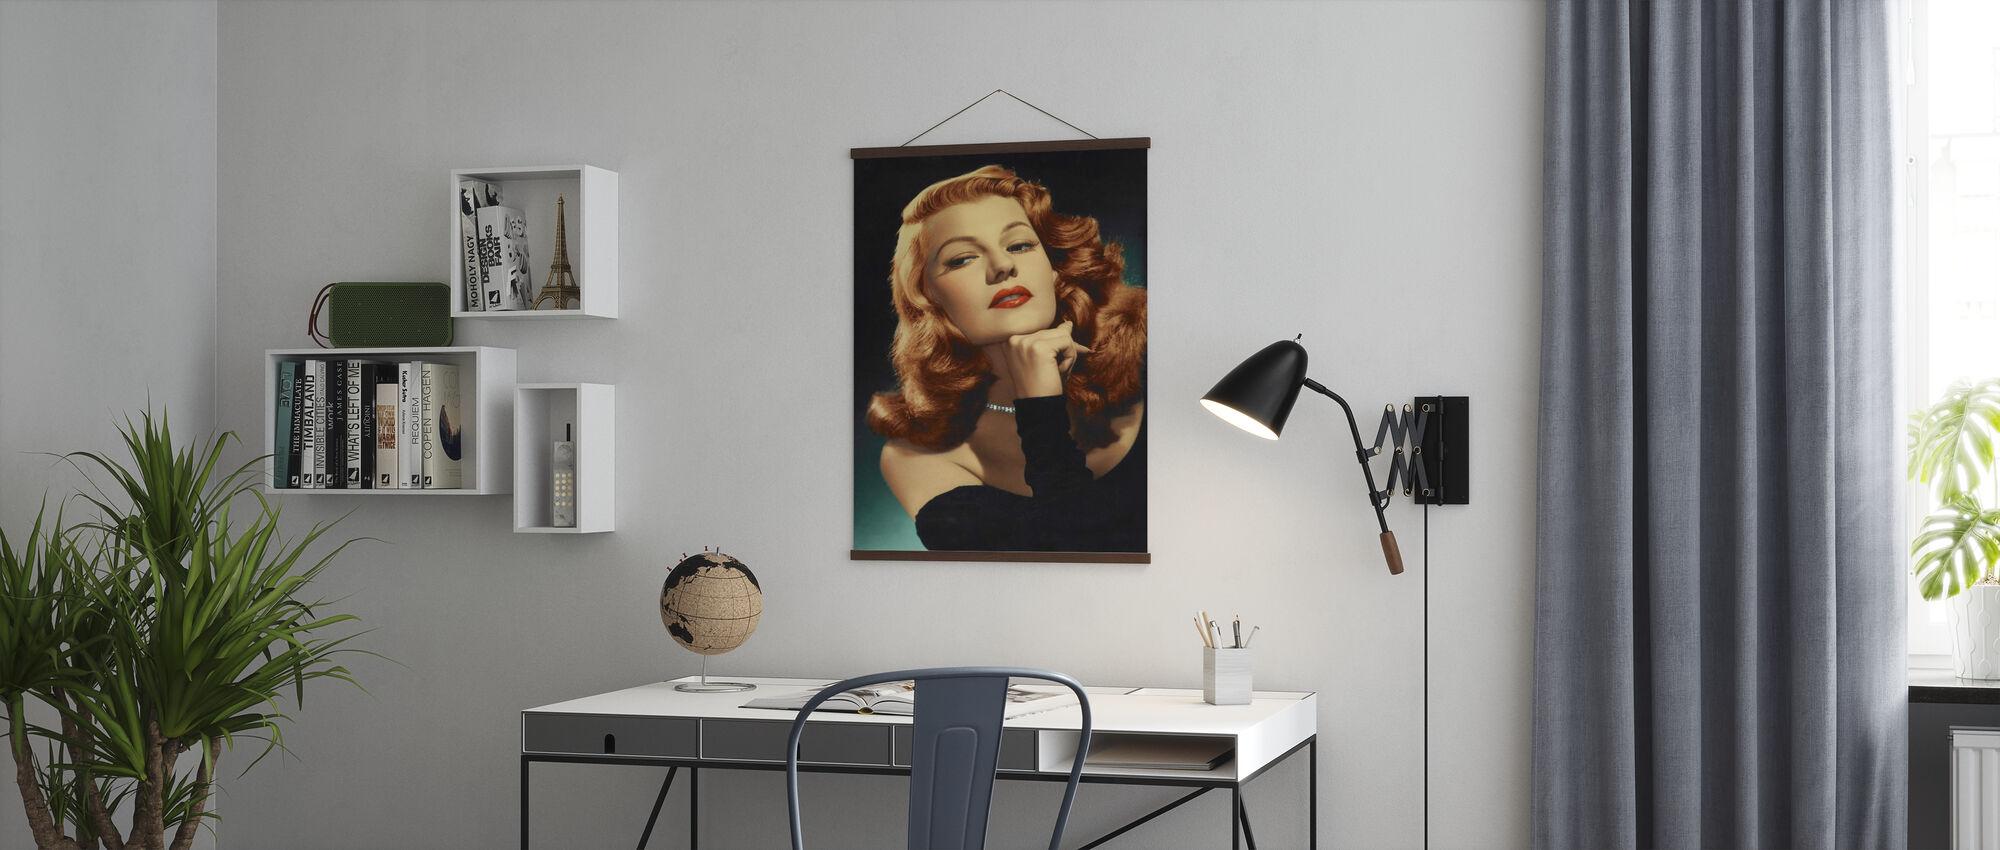 Rita Hayworth in Gilda - Poster - Kantoor